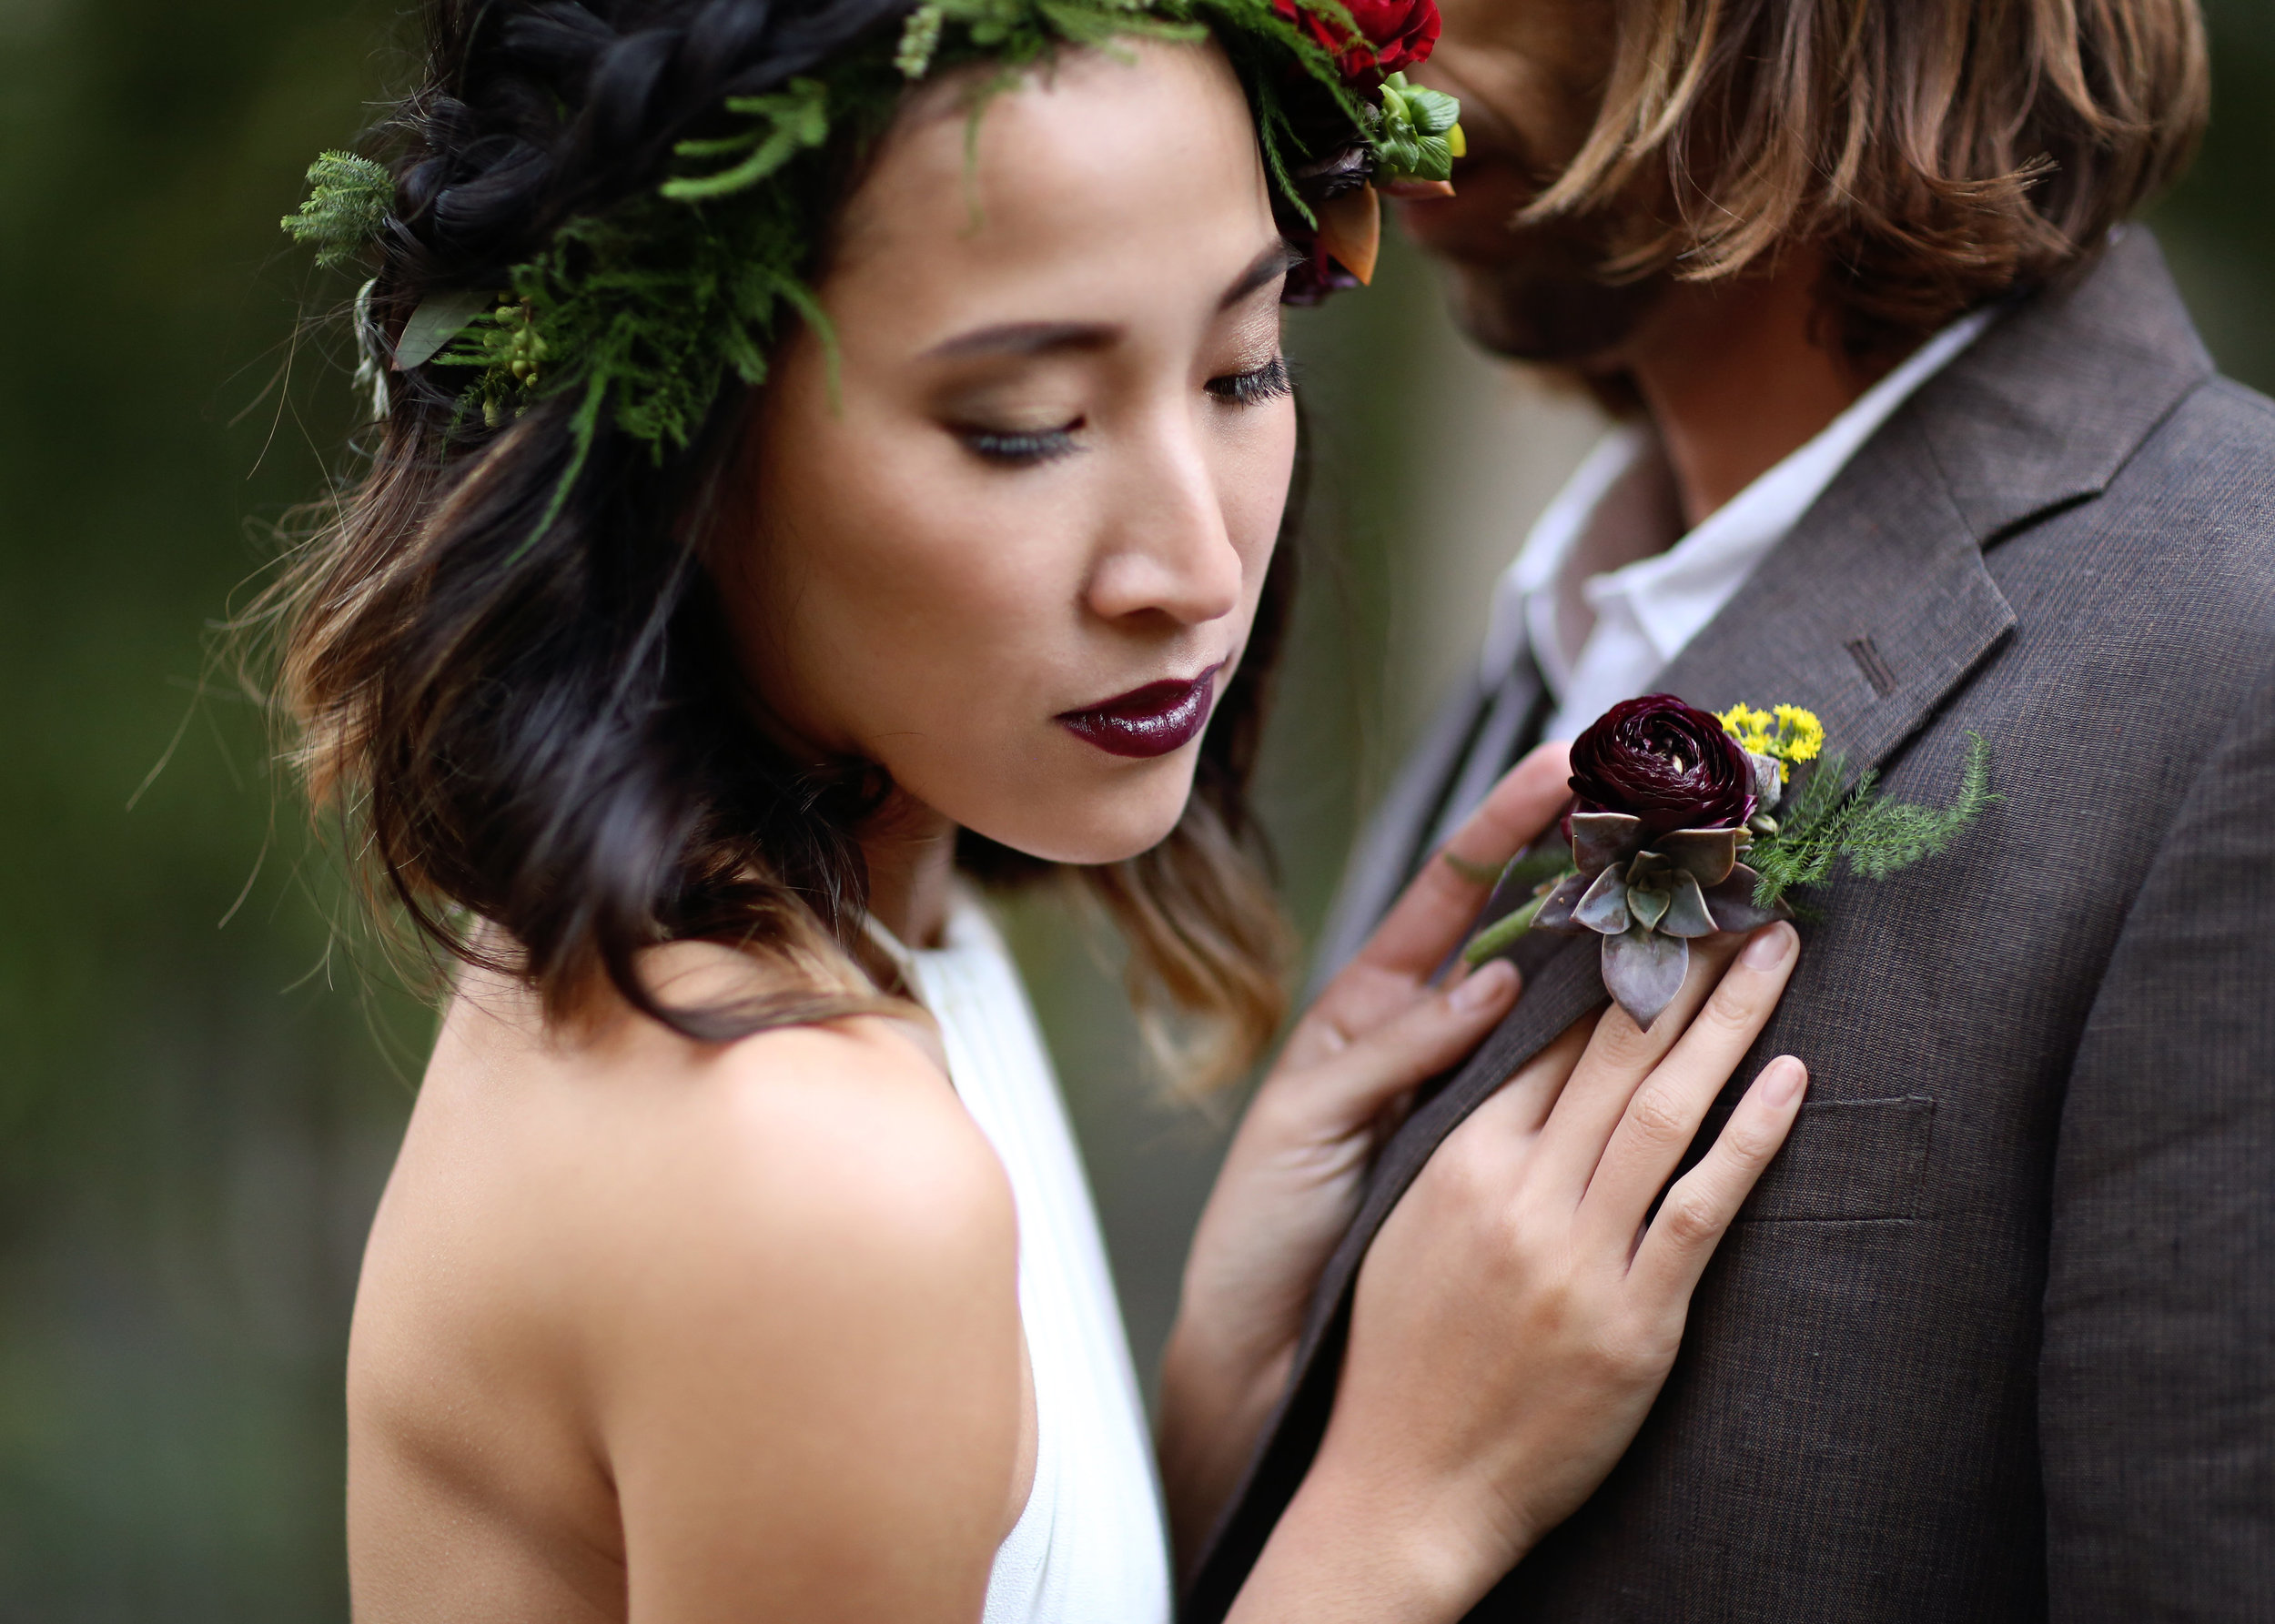 Boho Succulent Boutonniere -A Modern Bohemian Outdoor Wedding Shoot - Bleudog Fotography